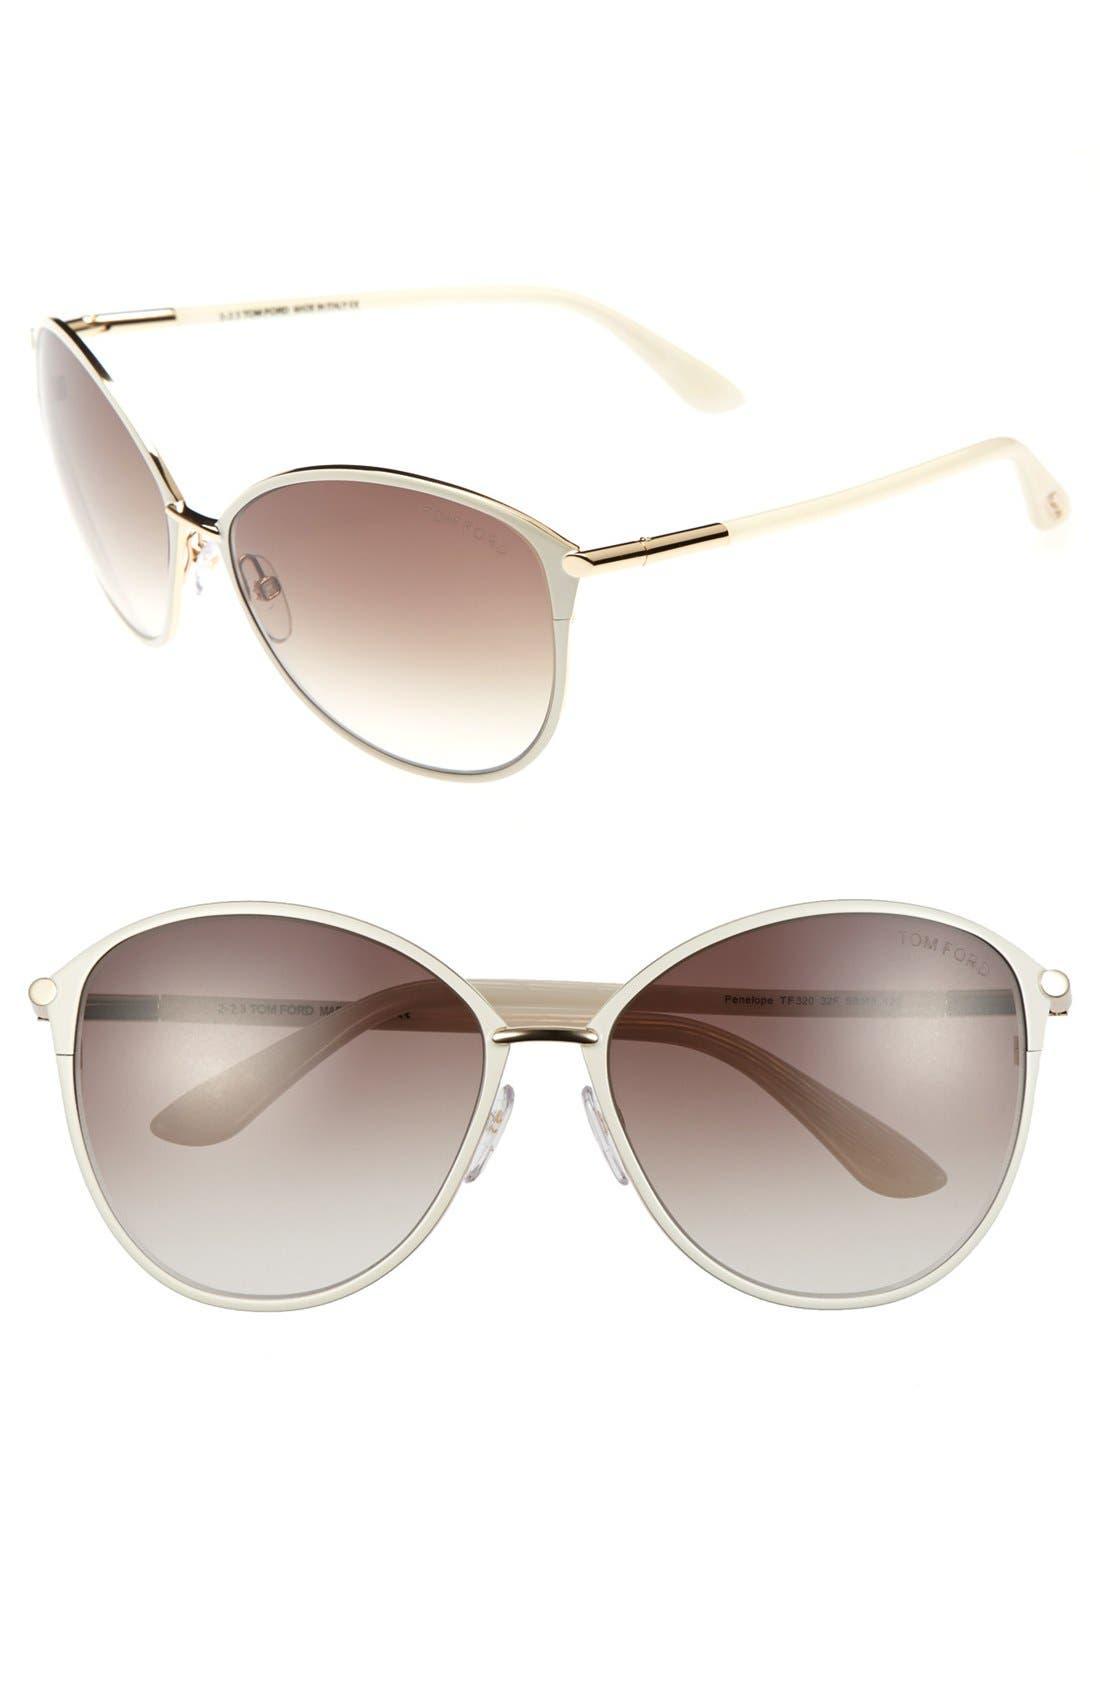 Tom Ford Penelope 5m Gradient Cat Eye Sunglasses - Shiny Rose Gold/ Ivory